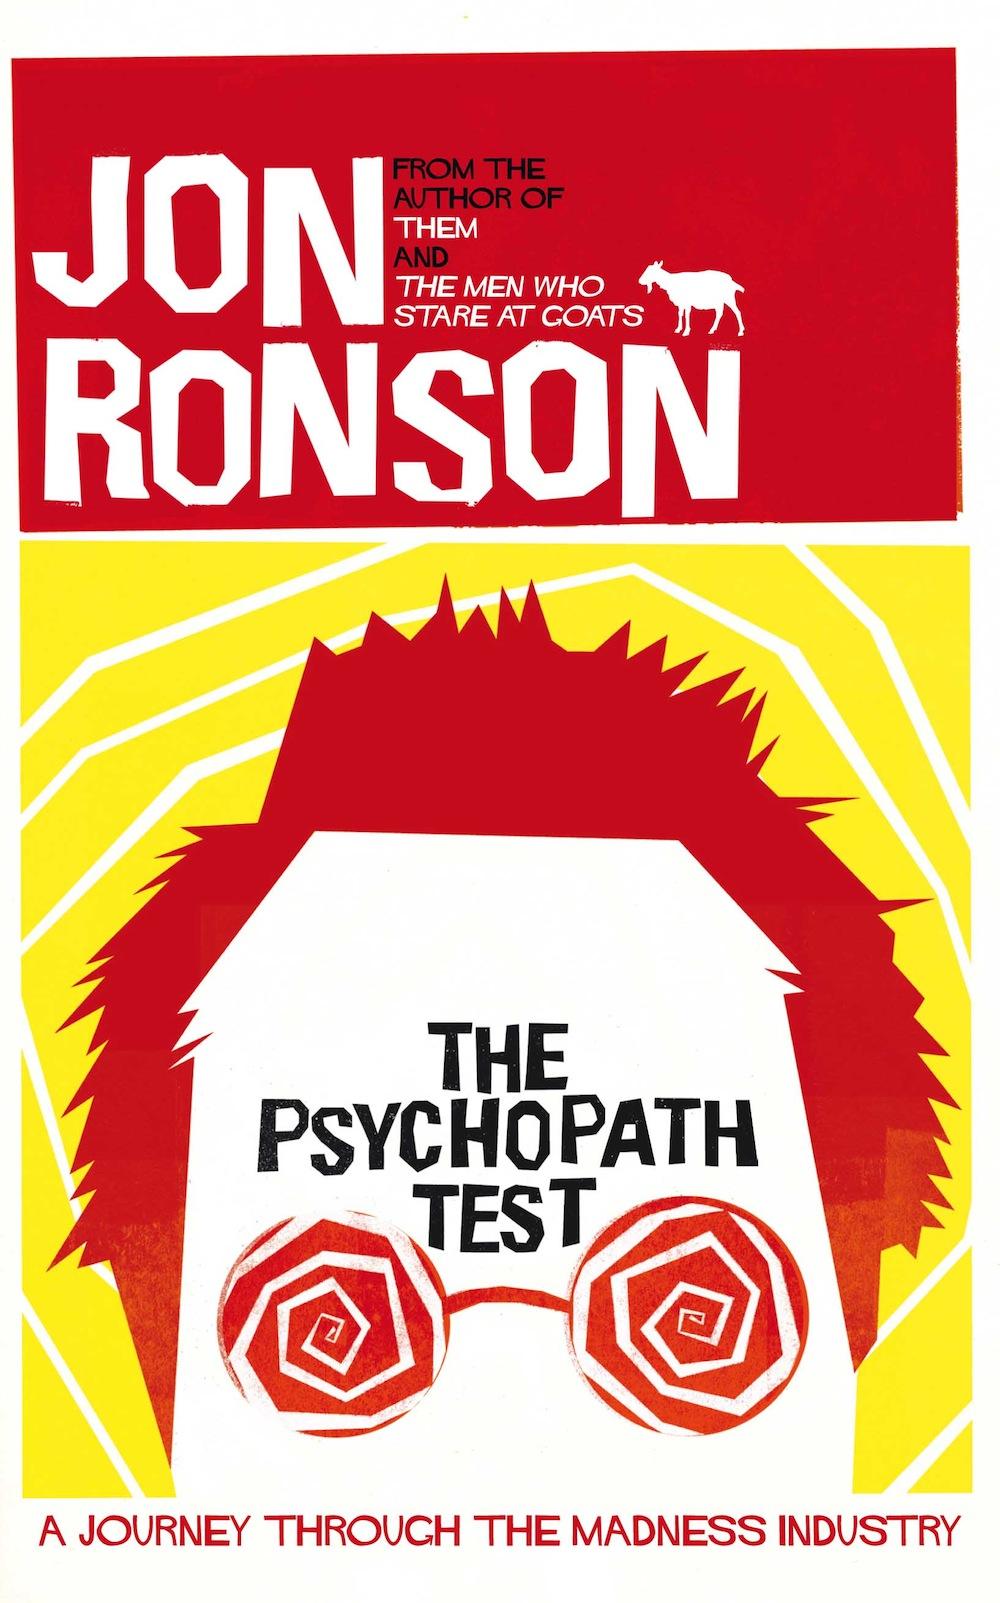 Jon-Ronson-The-Psychopath-Test.jpg